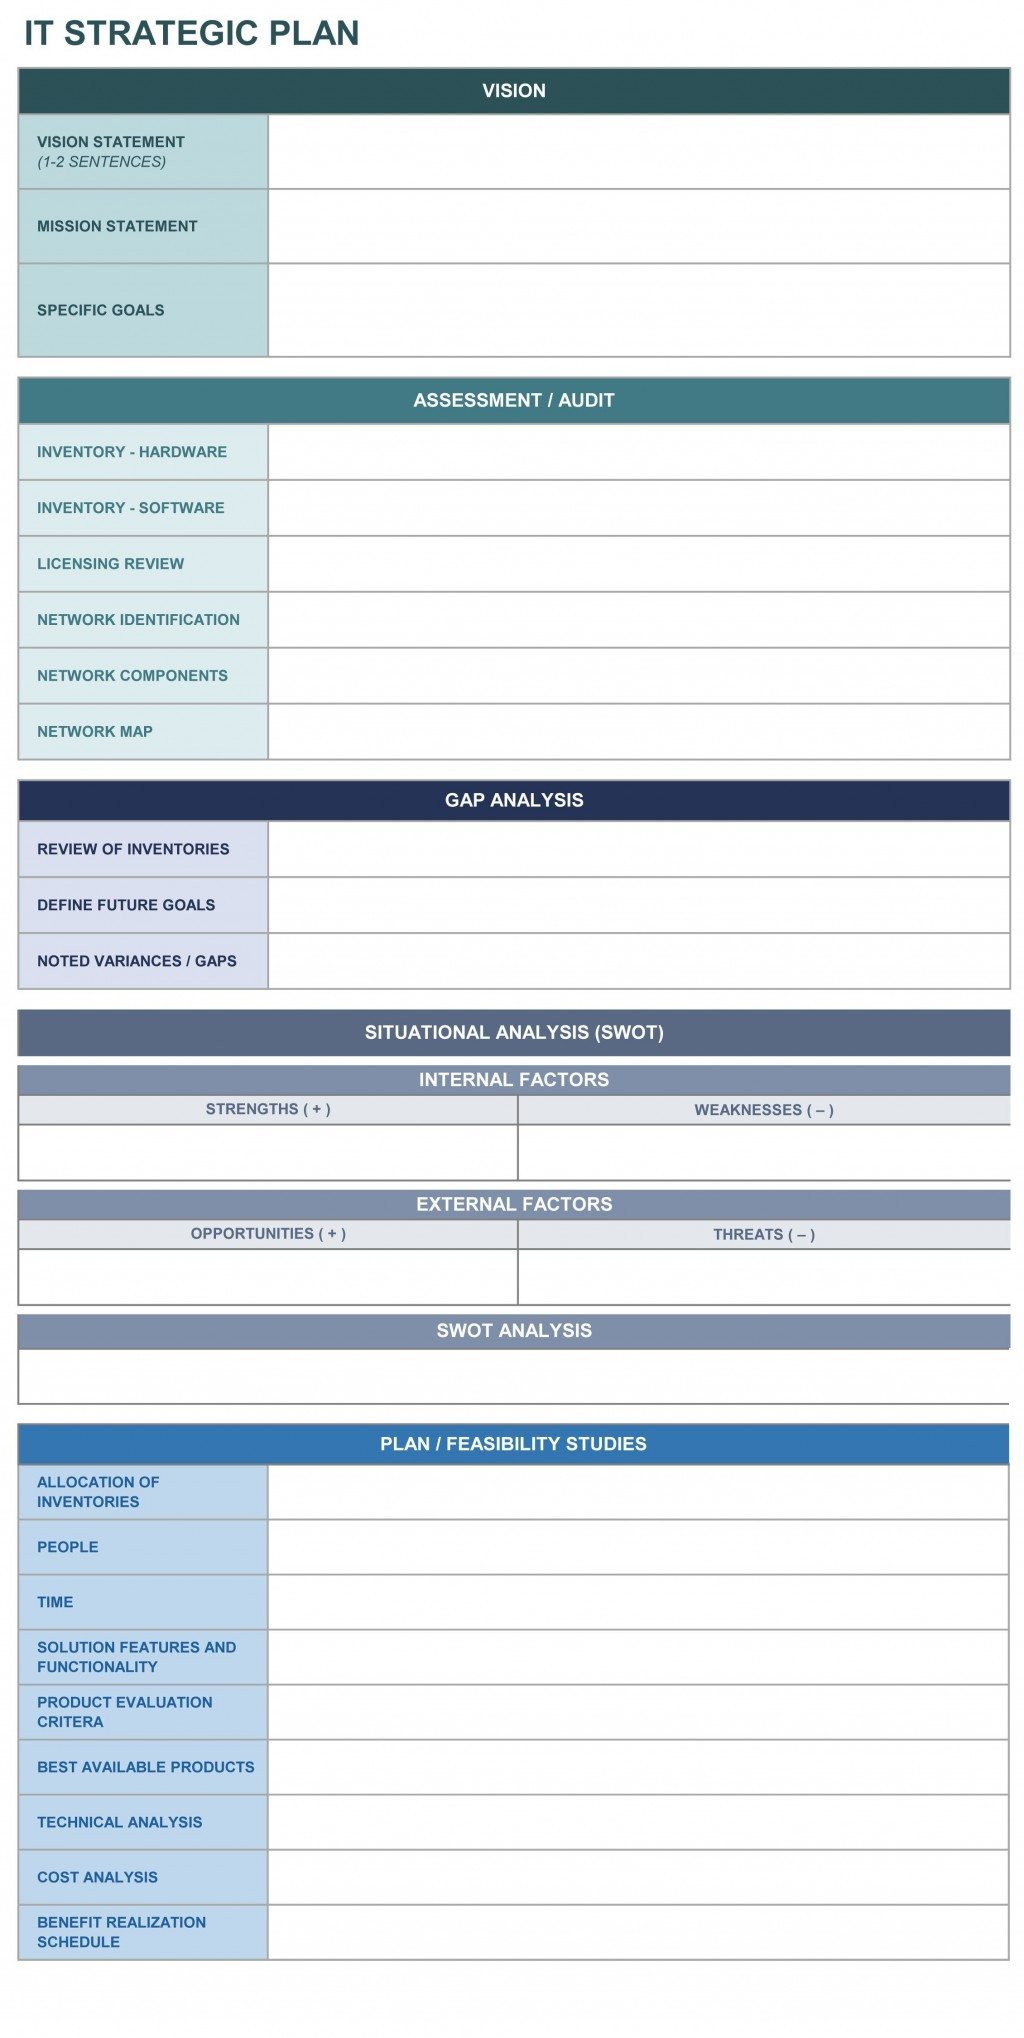 001 Breathtaking Strategic Plan Template Excel High Def  Action CommunicationLarge